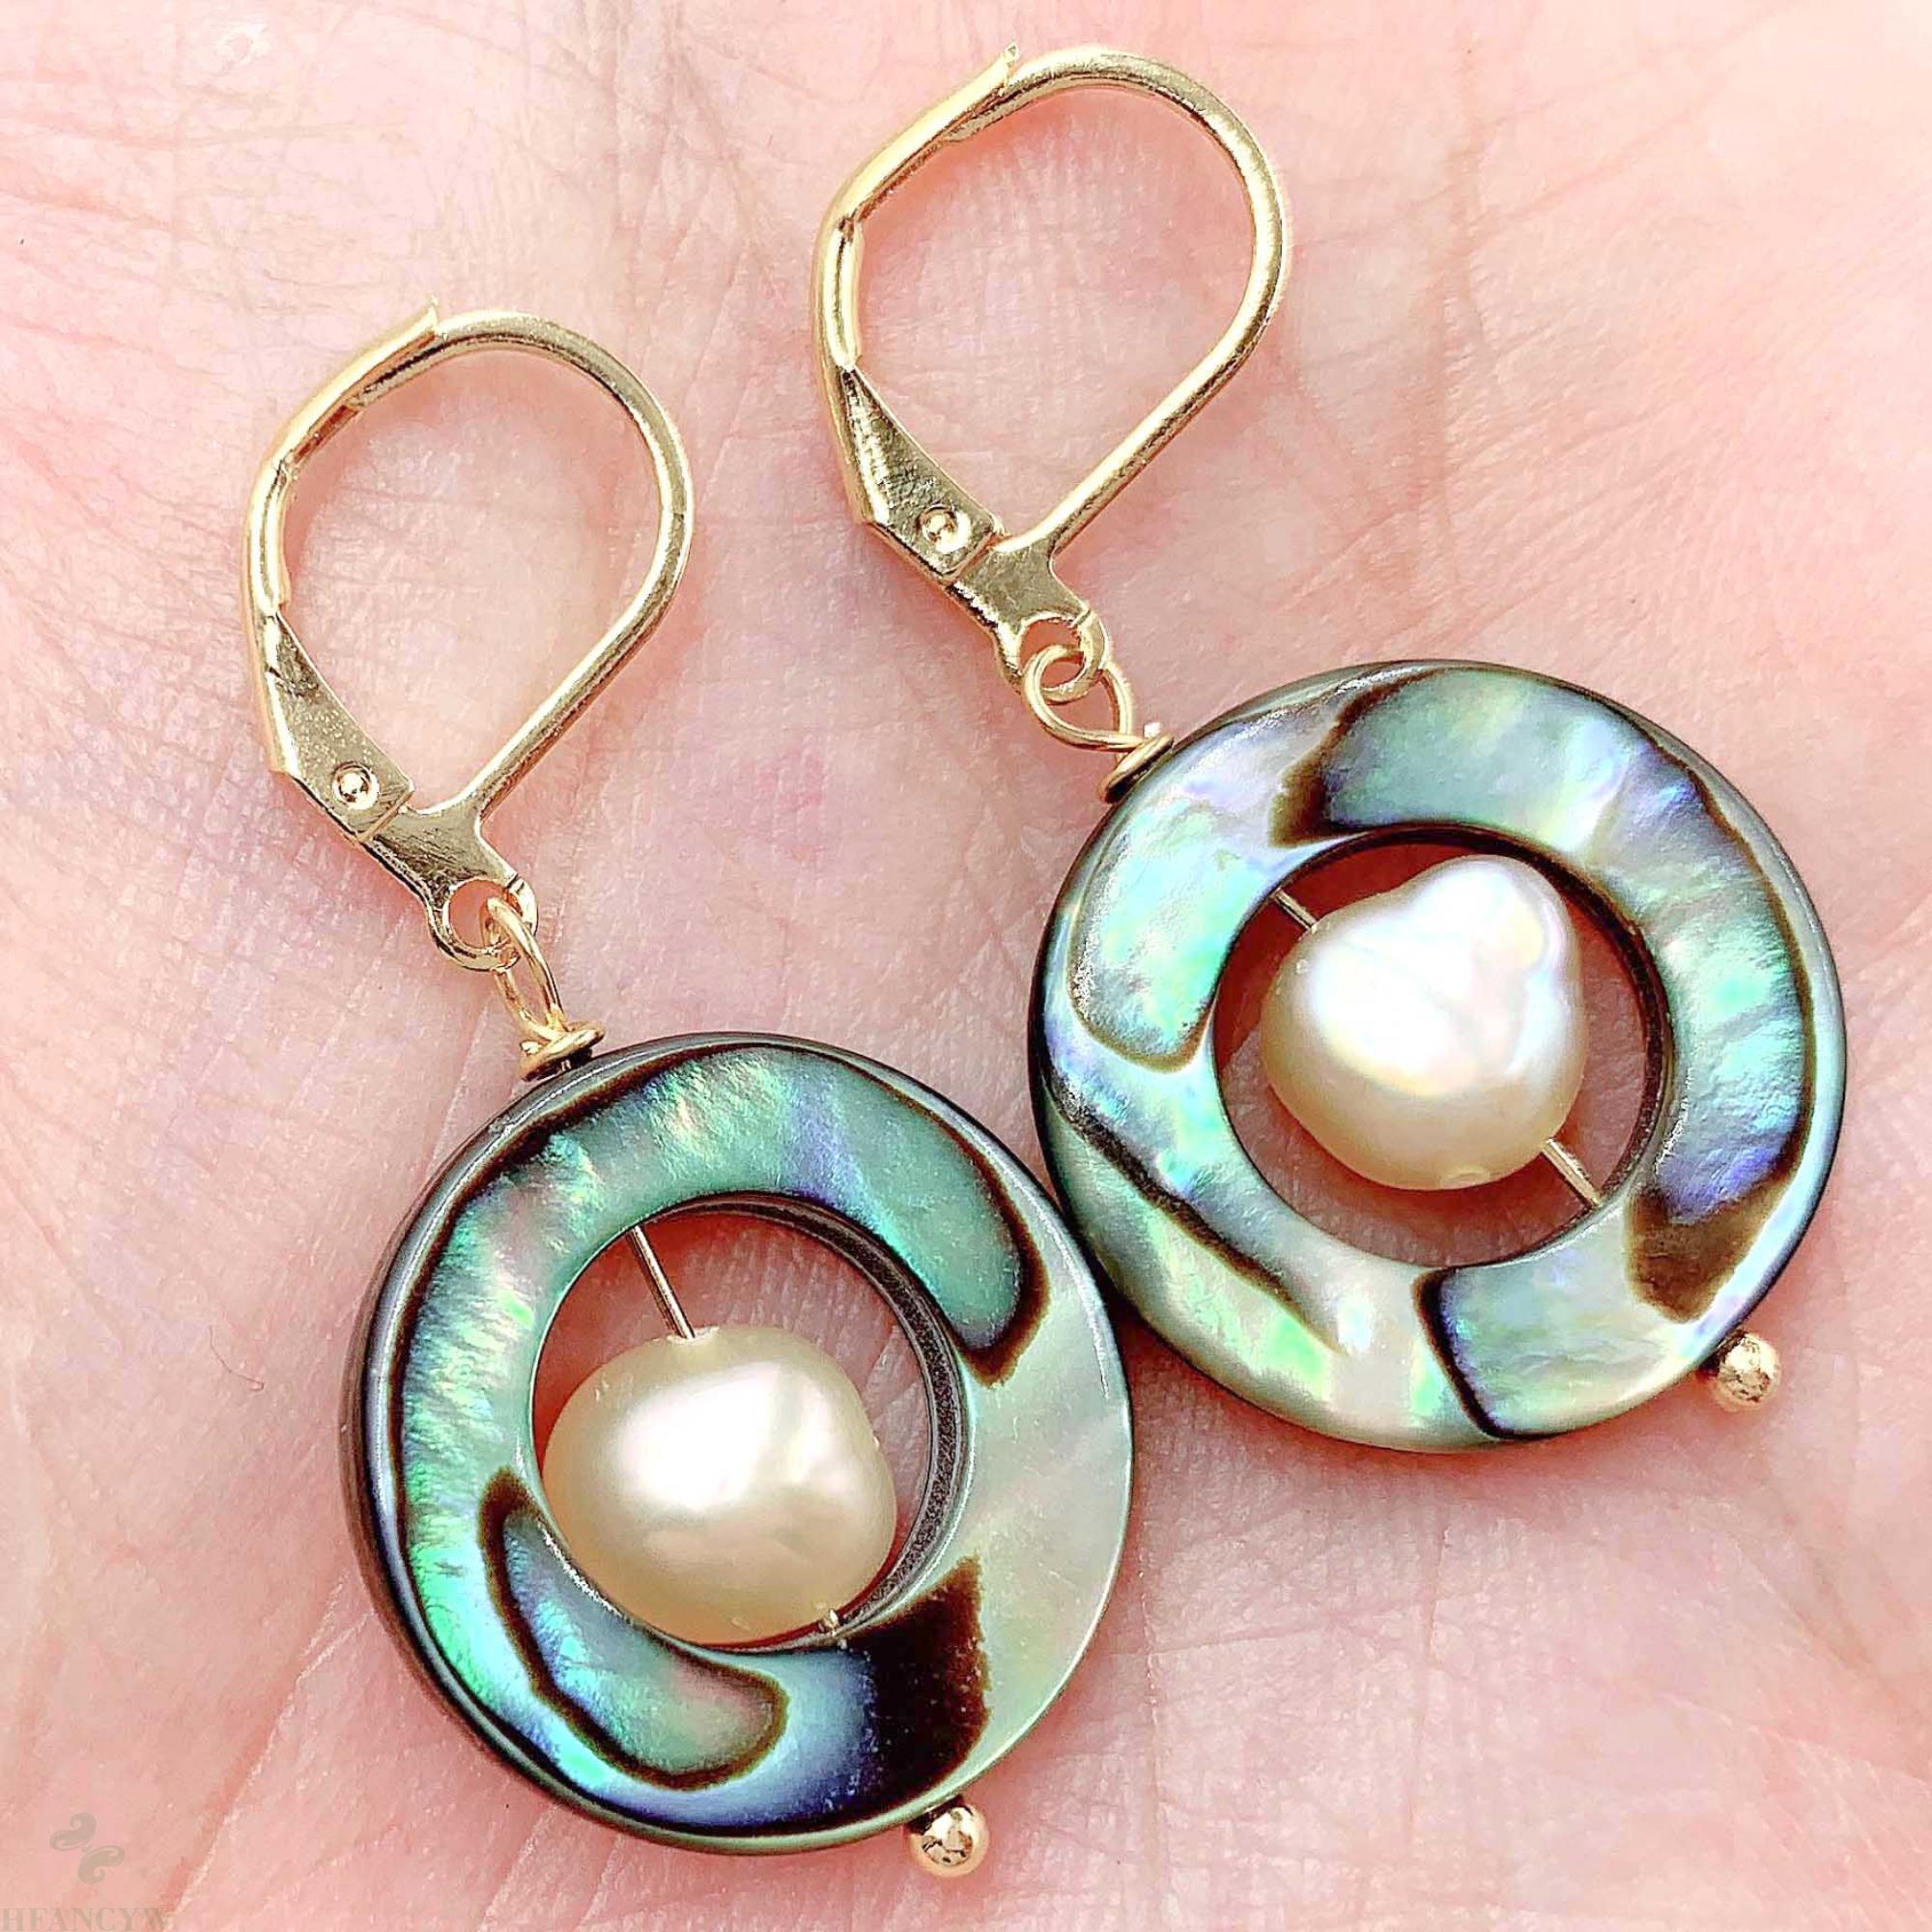 18x18mm Abalone Shell Rosa Barocke Perle Ohrringe 18k Ohr Drop Mesmerizing Luxus Züchteten Unregelmäßigen Party Klassische aurora Baumeln